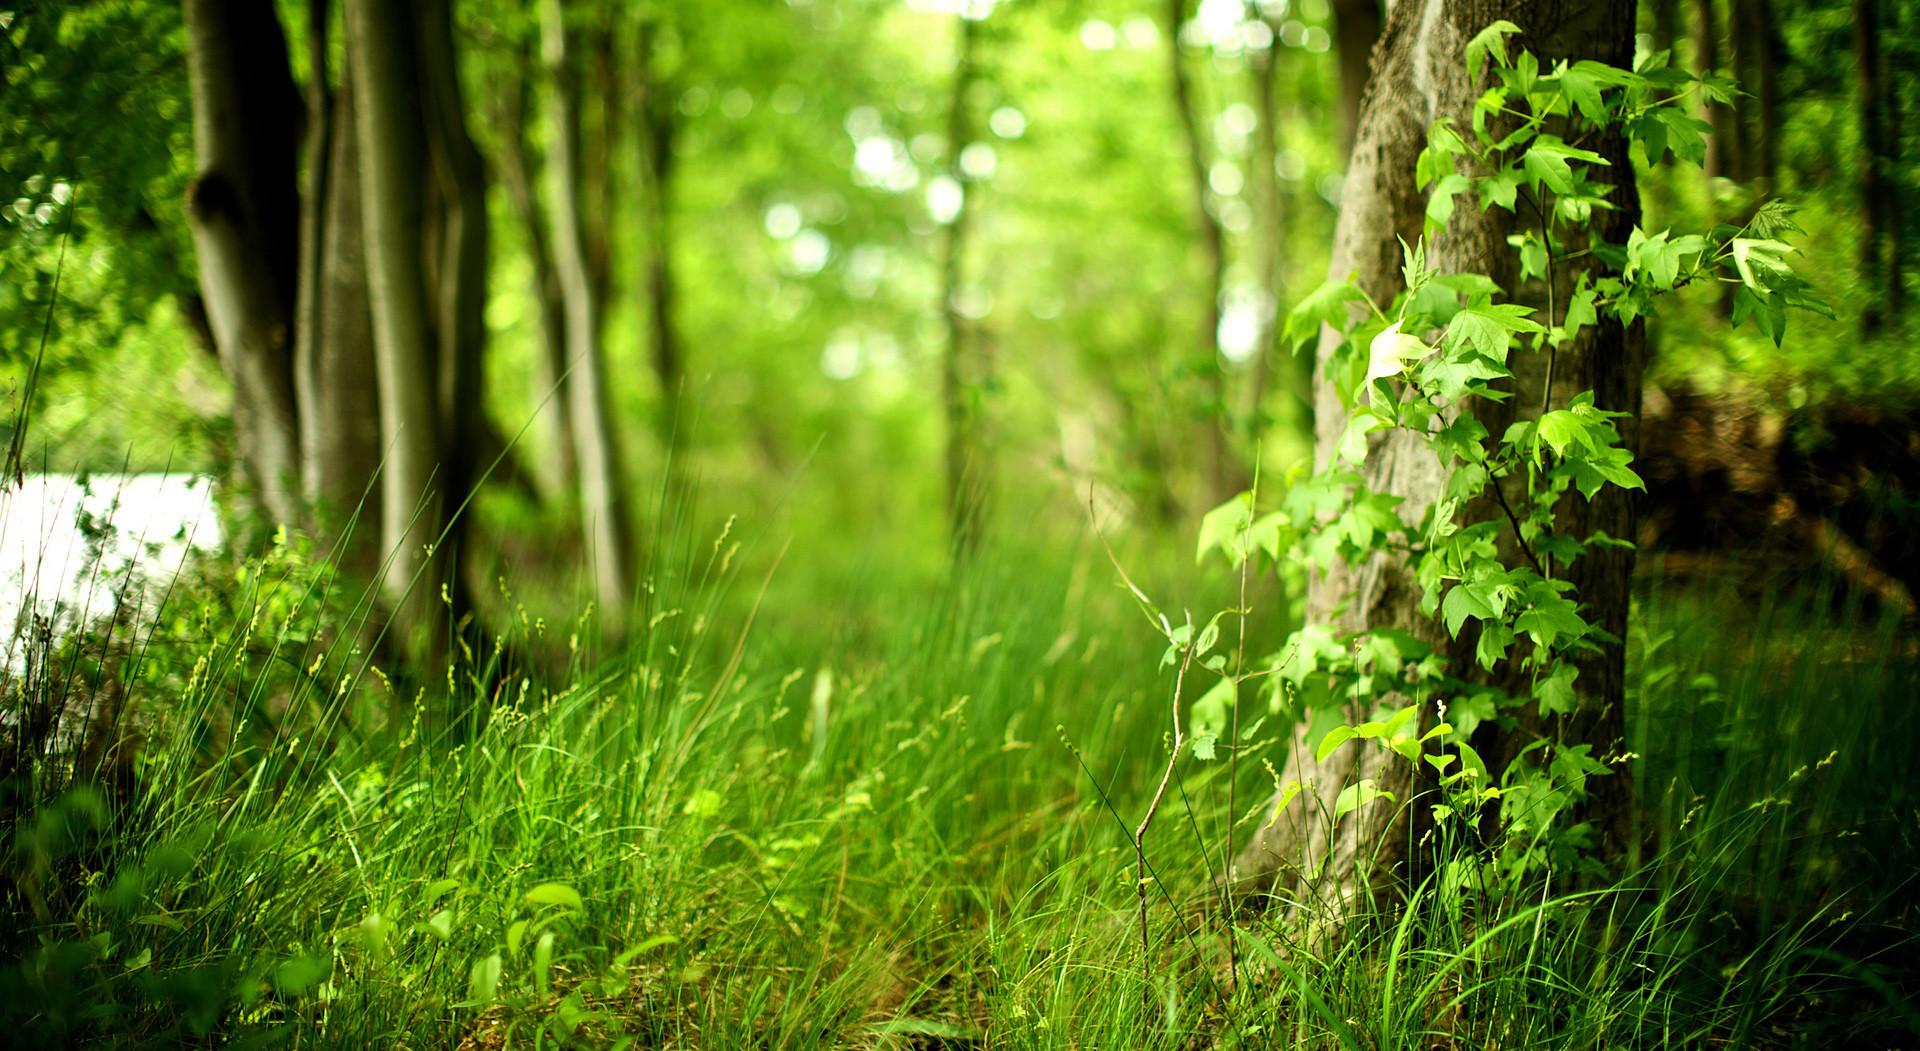 Forest Desktop Wallpapers | 43 HD Wallpapers, HD Pics